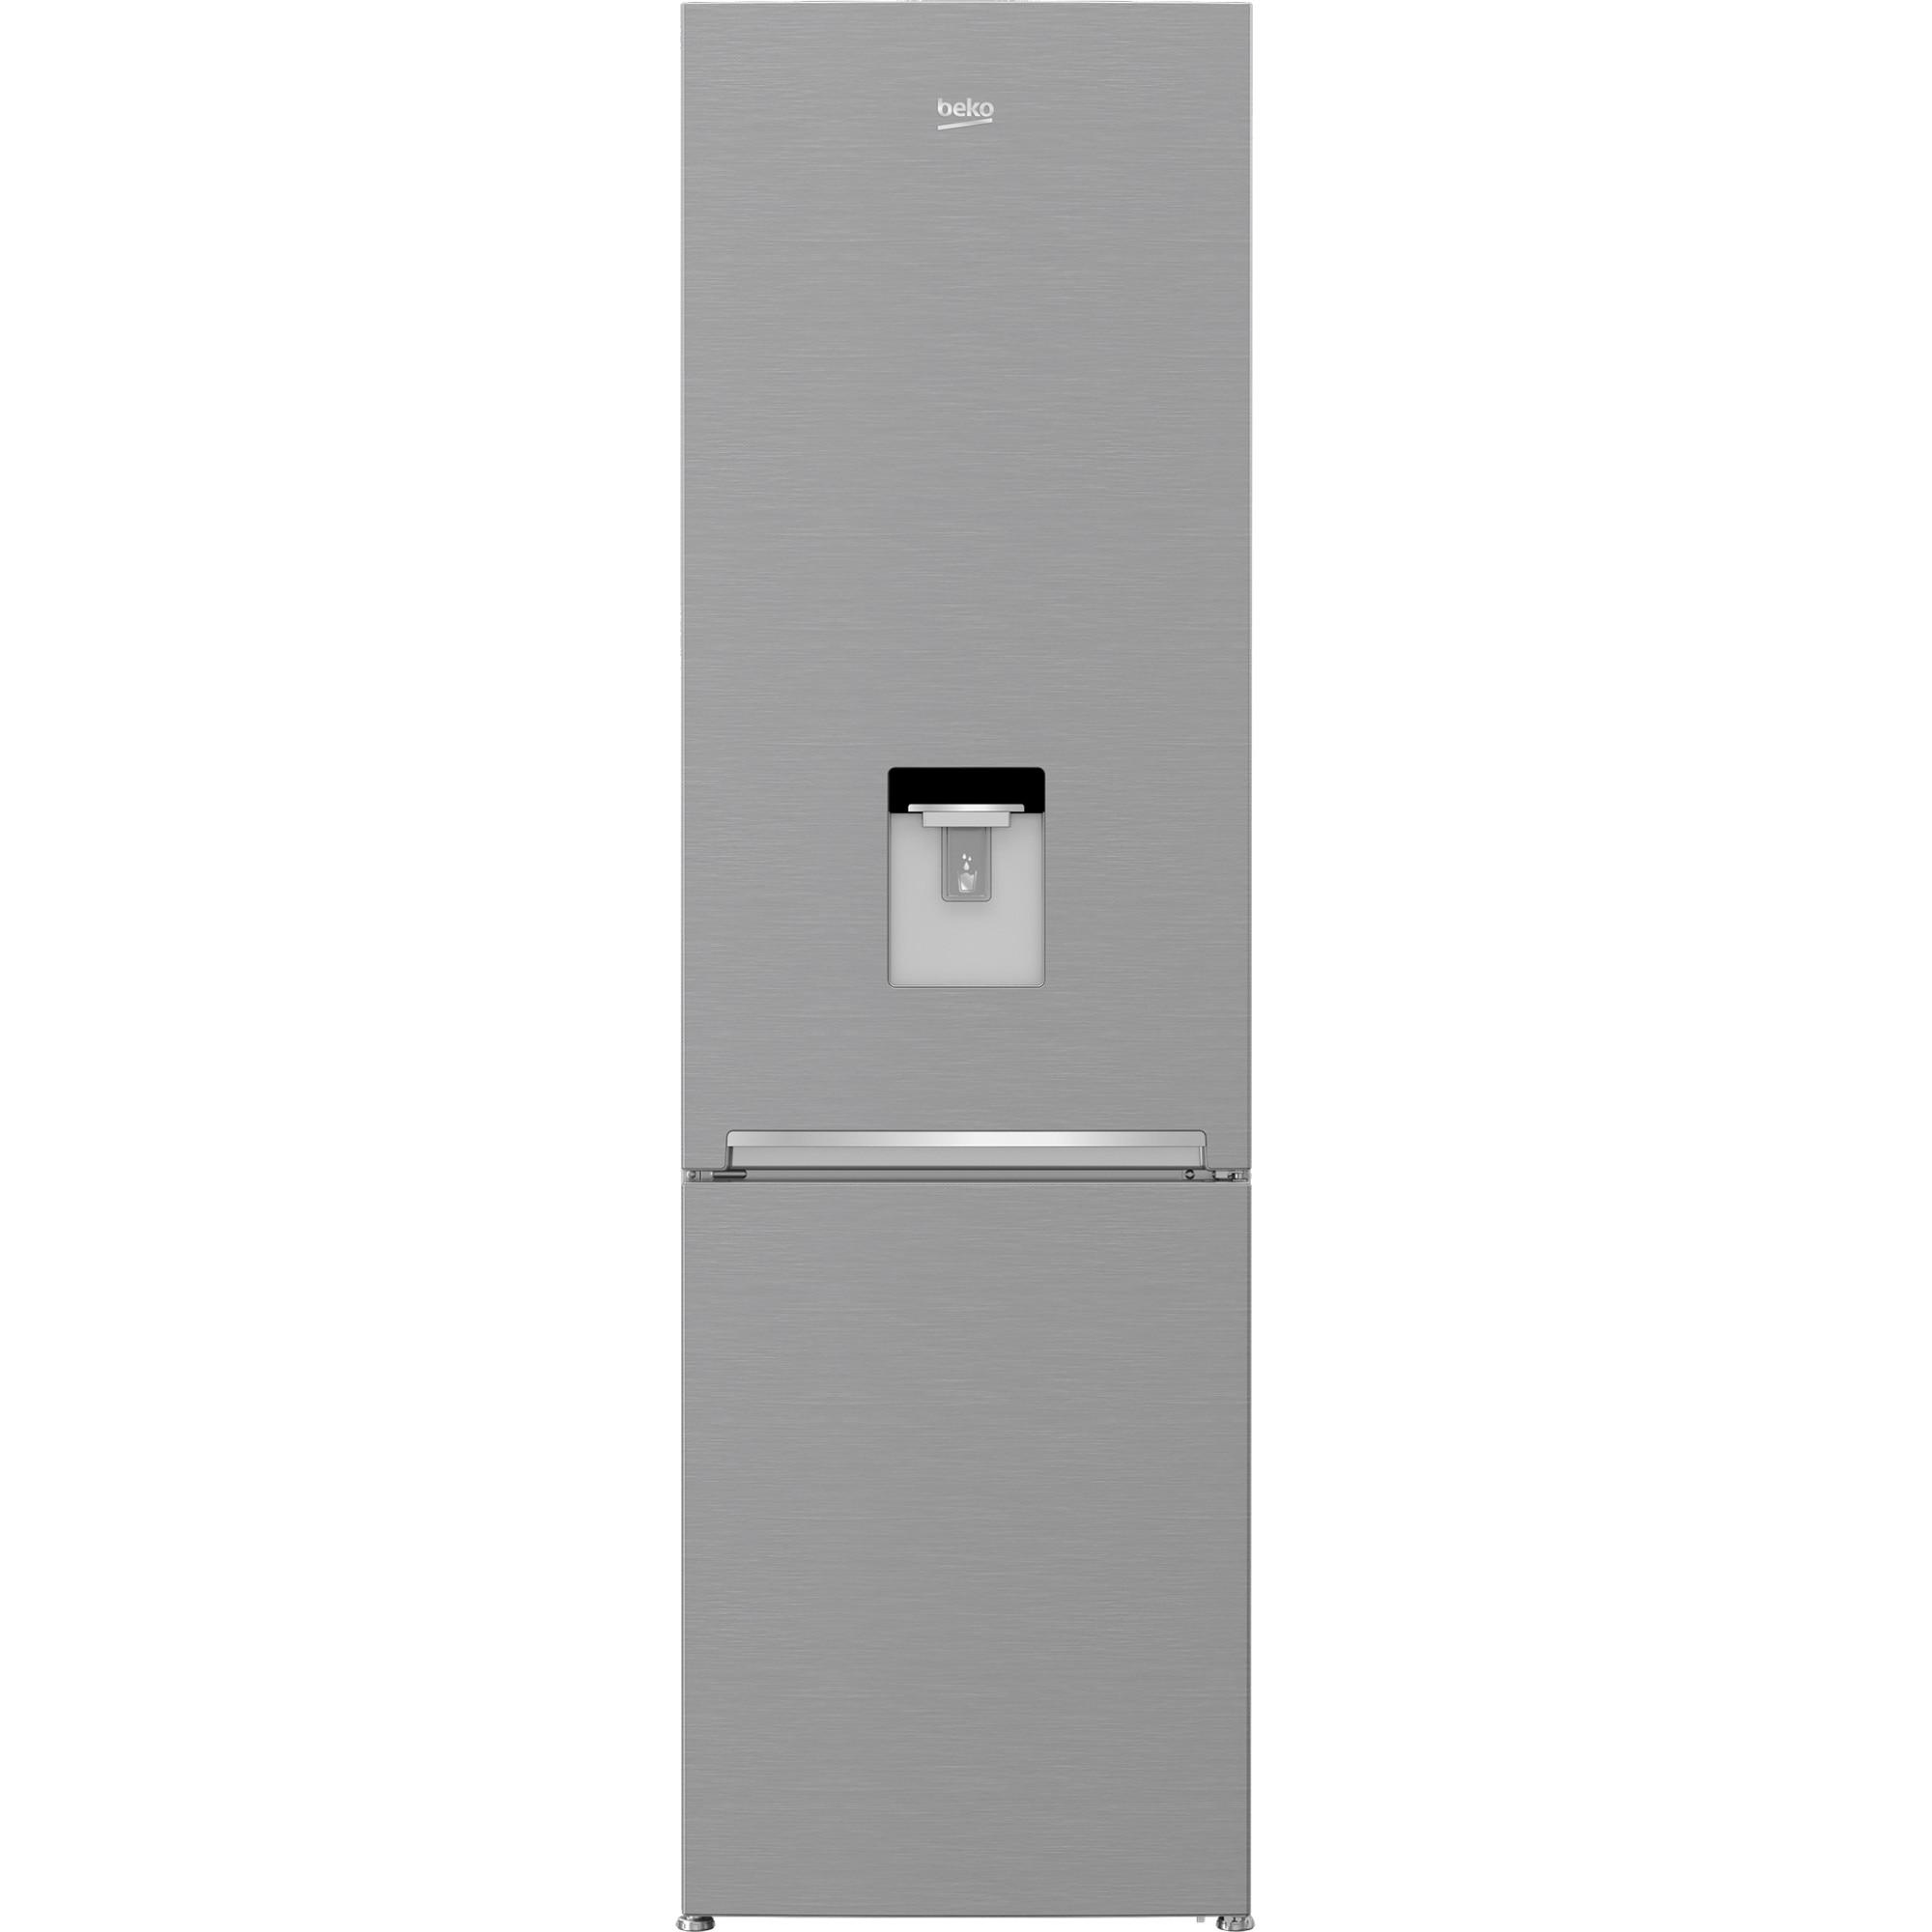 Fotografie Combina frigorifica Beko RCSA406K40DXBN, 386 l, Clasa A++, Dozator apa, H 202.5 cm, Argintiu